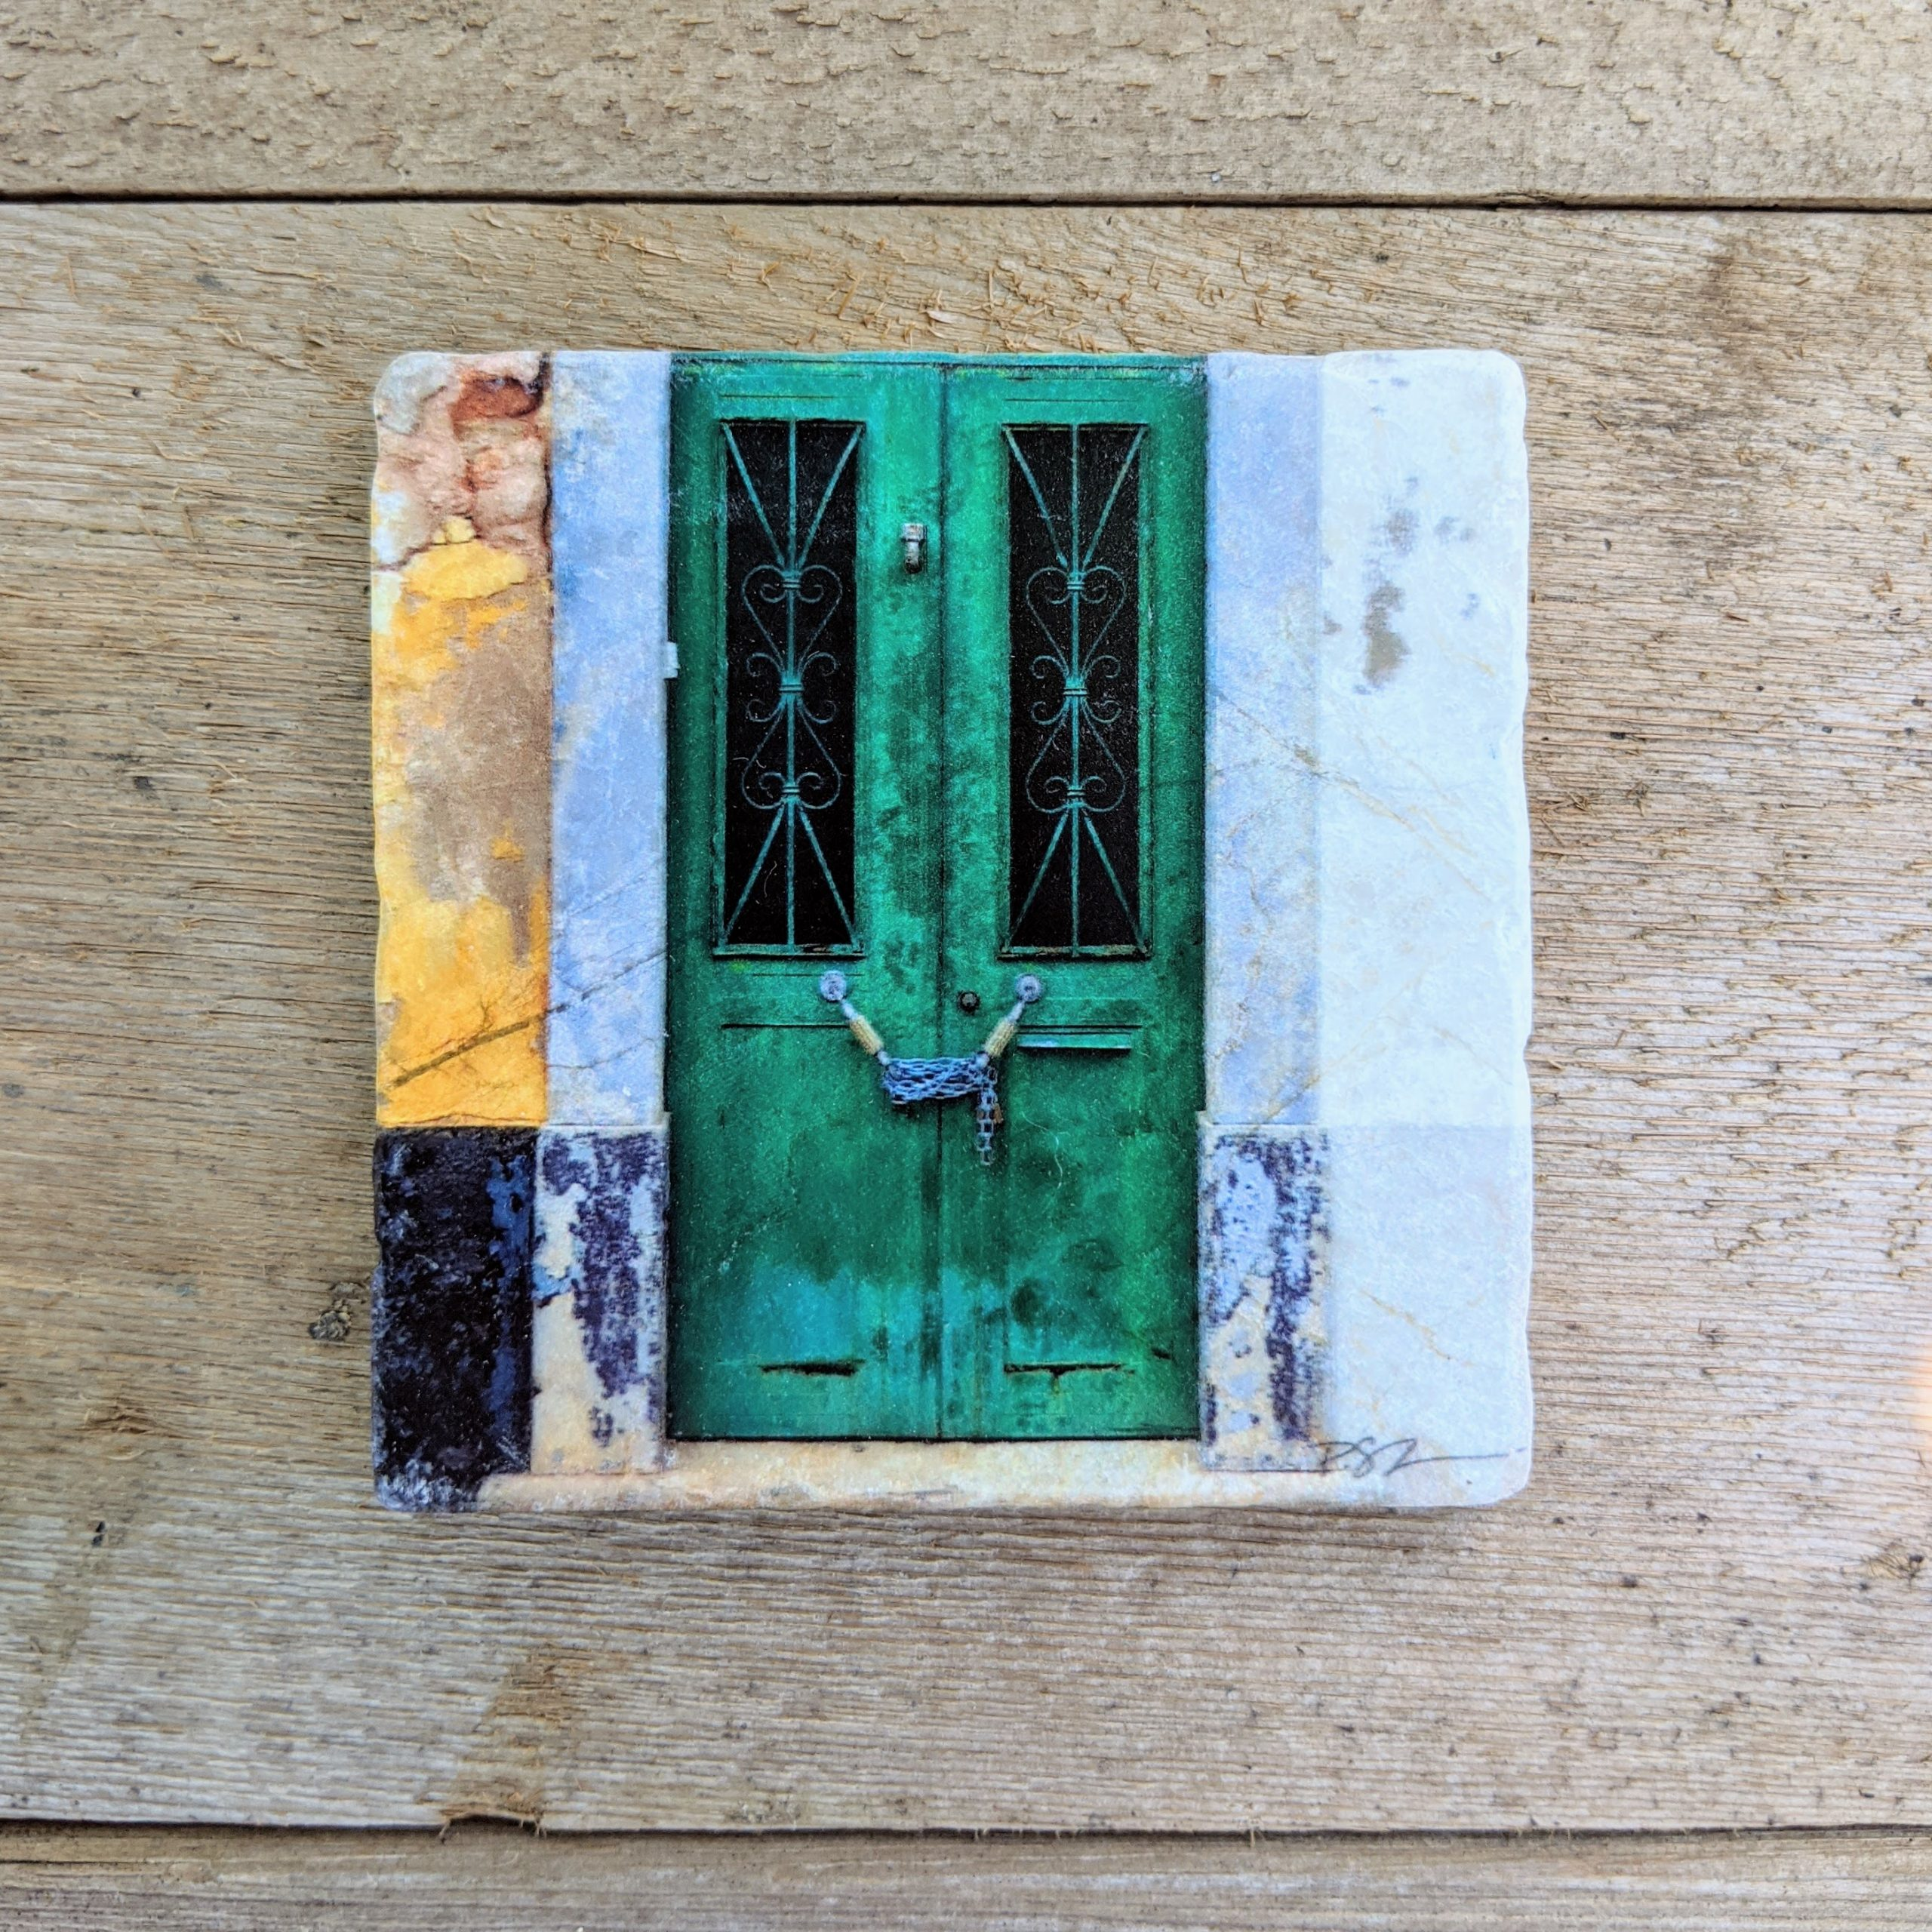 Marble Art Coaster - Portugal Door Grn